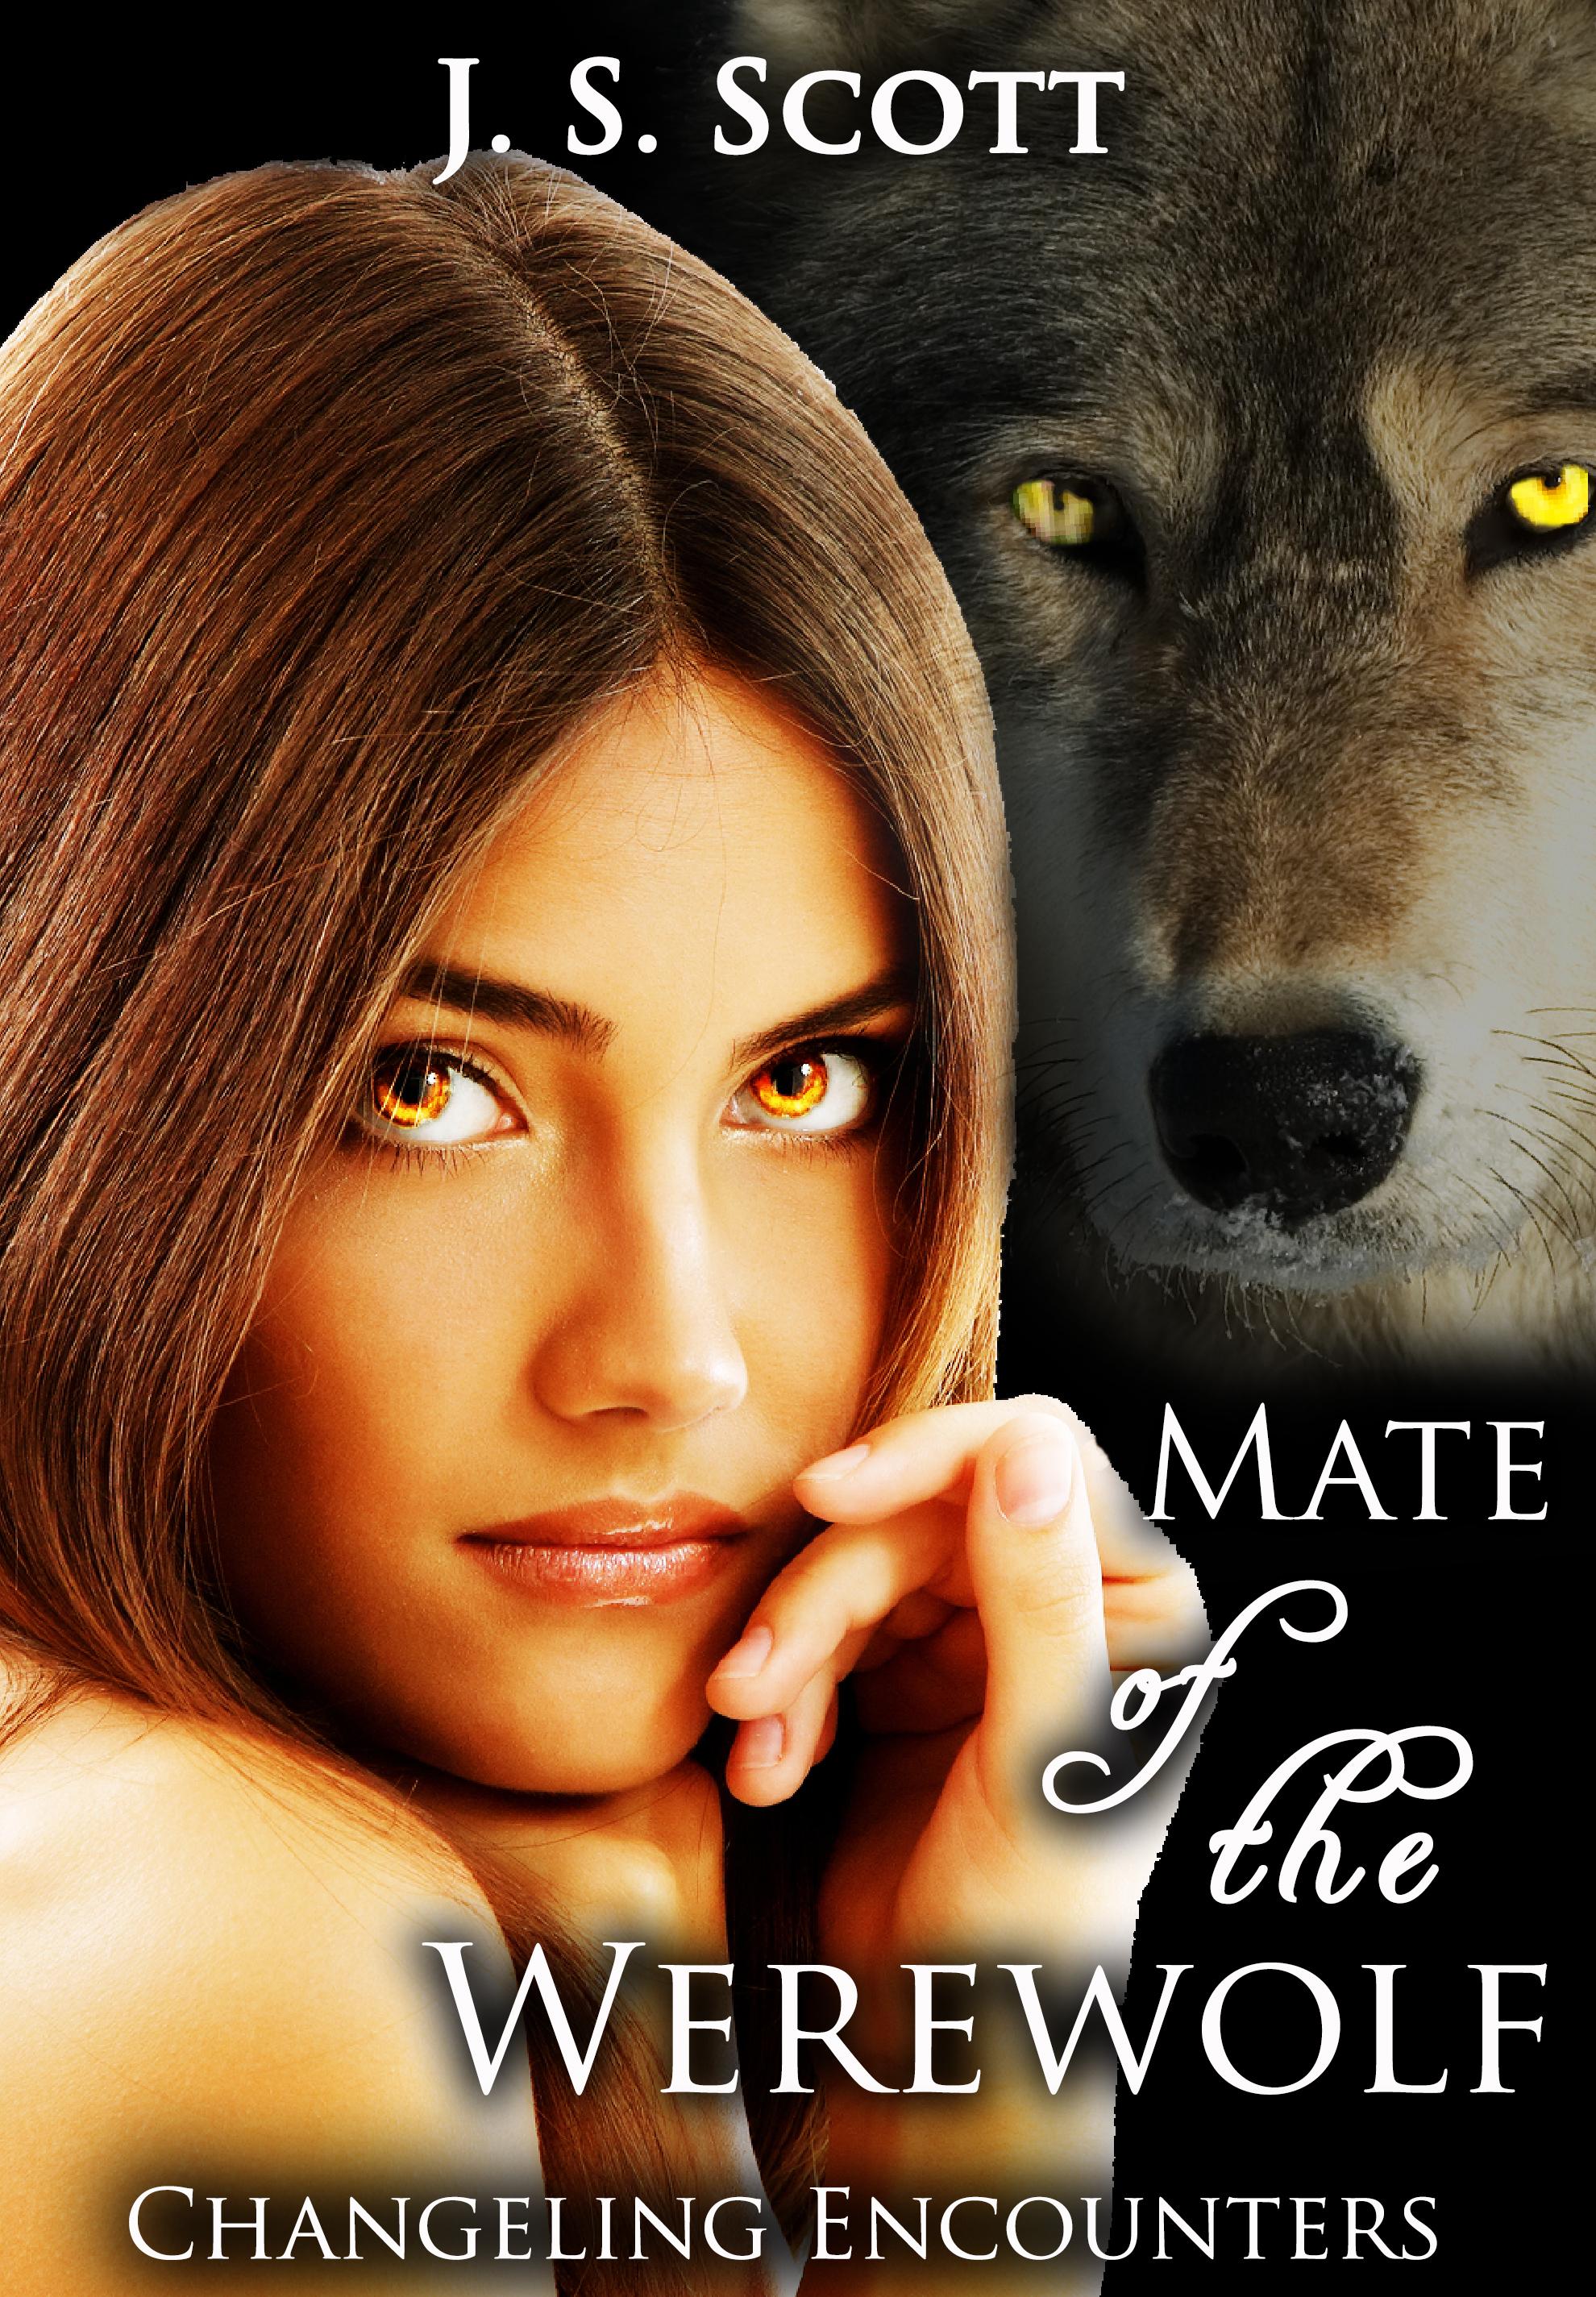 J. S. Scott - Mate Of The Werewolf (Changeling Encounters)